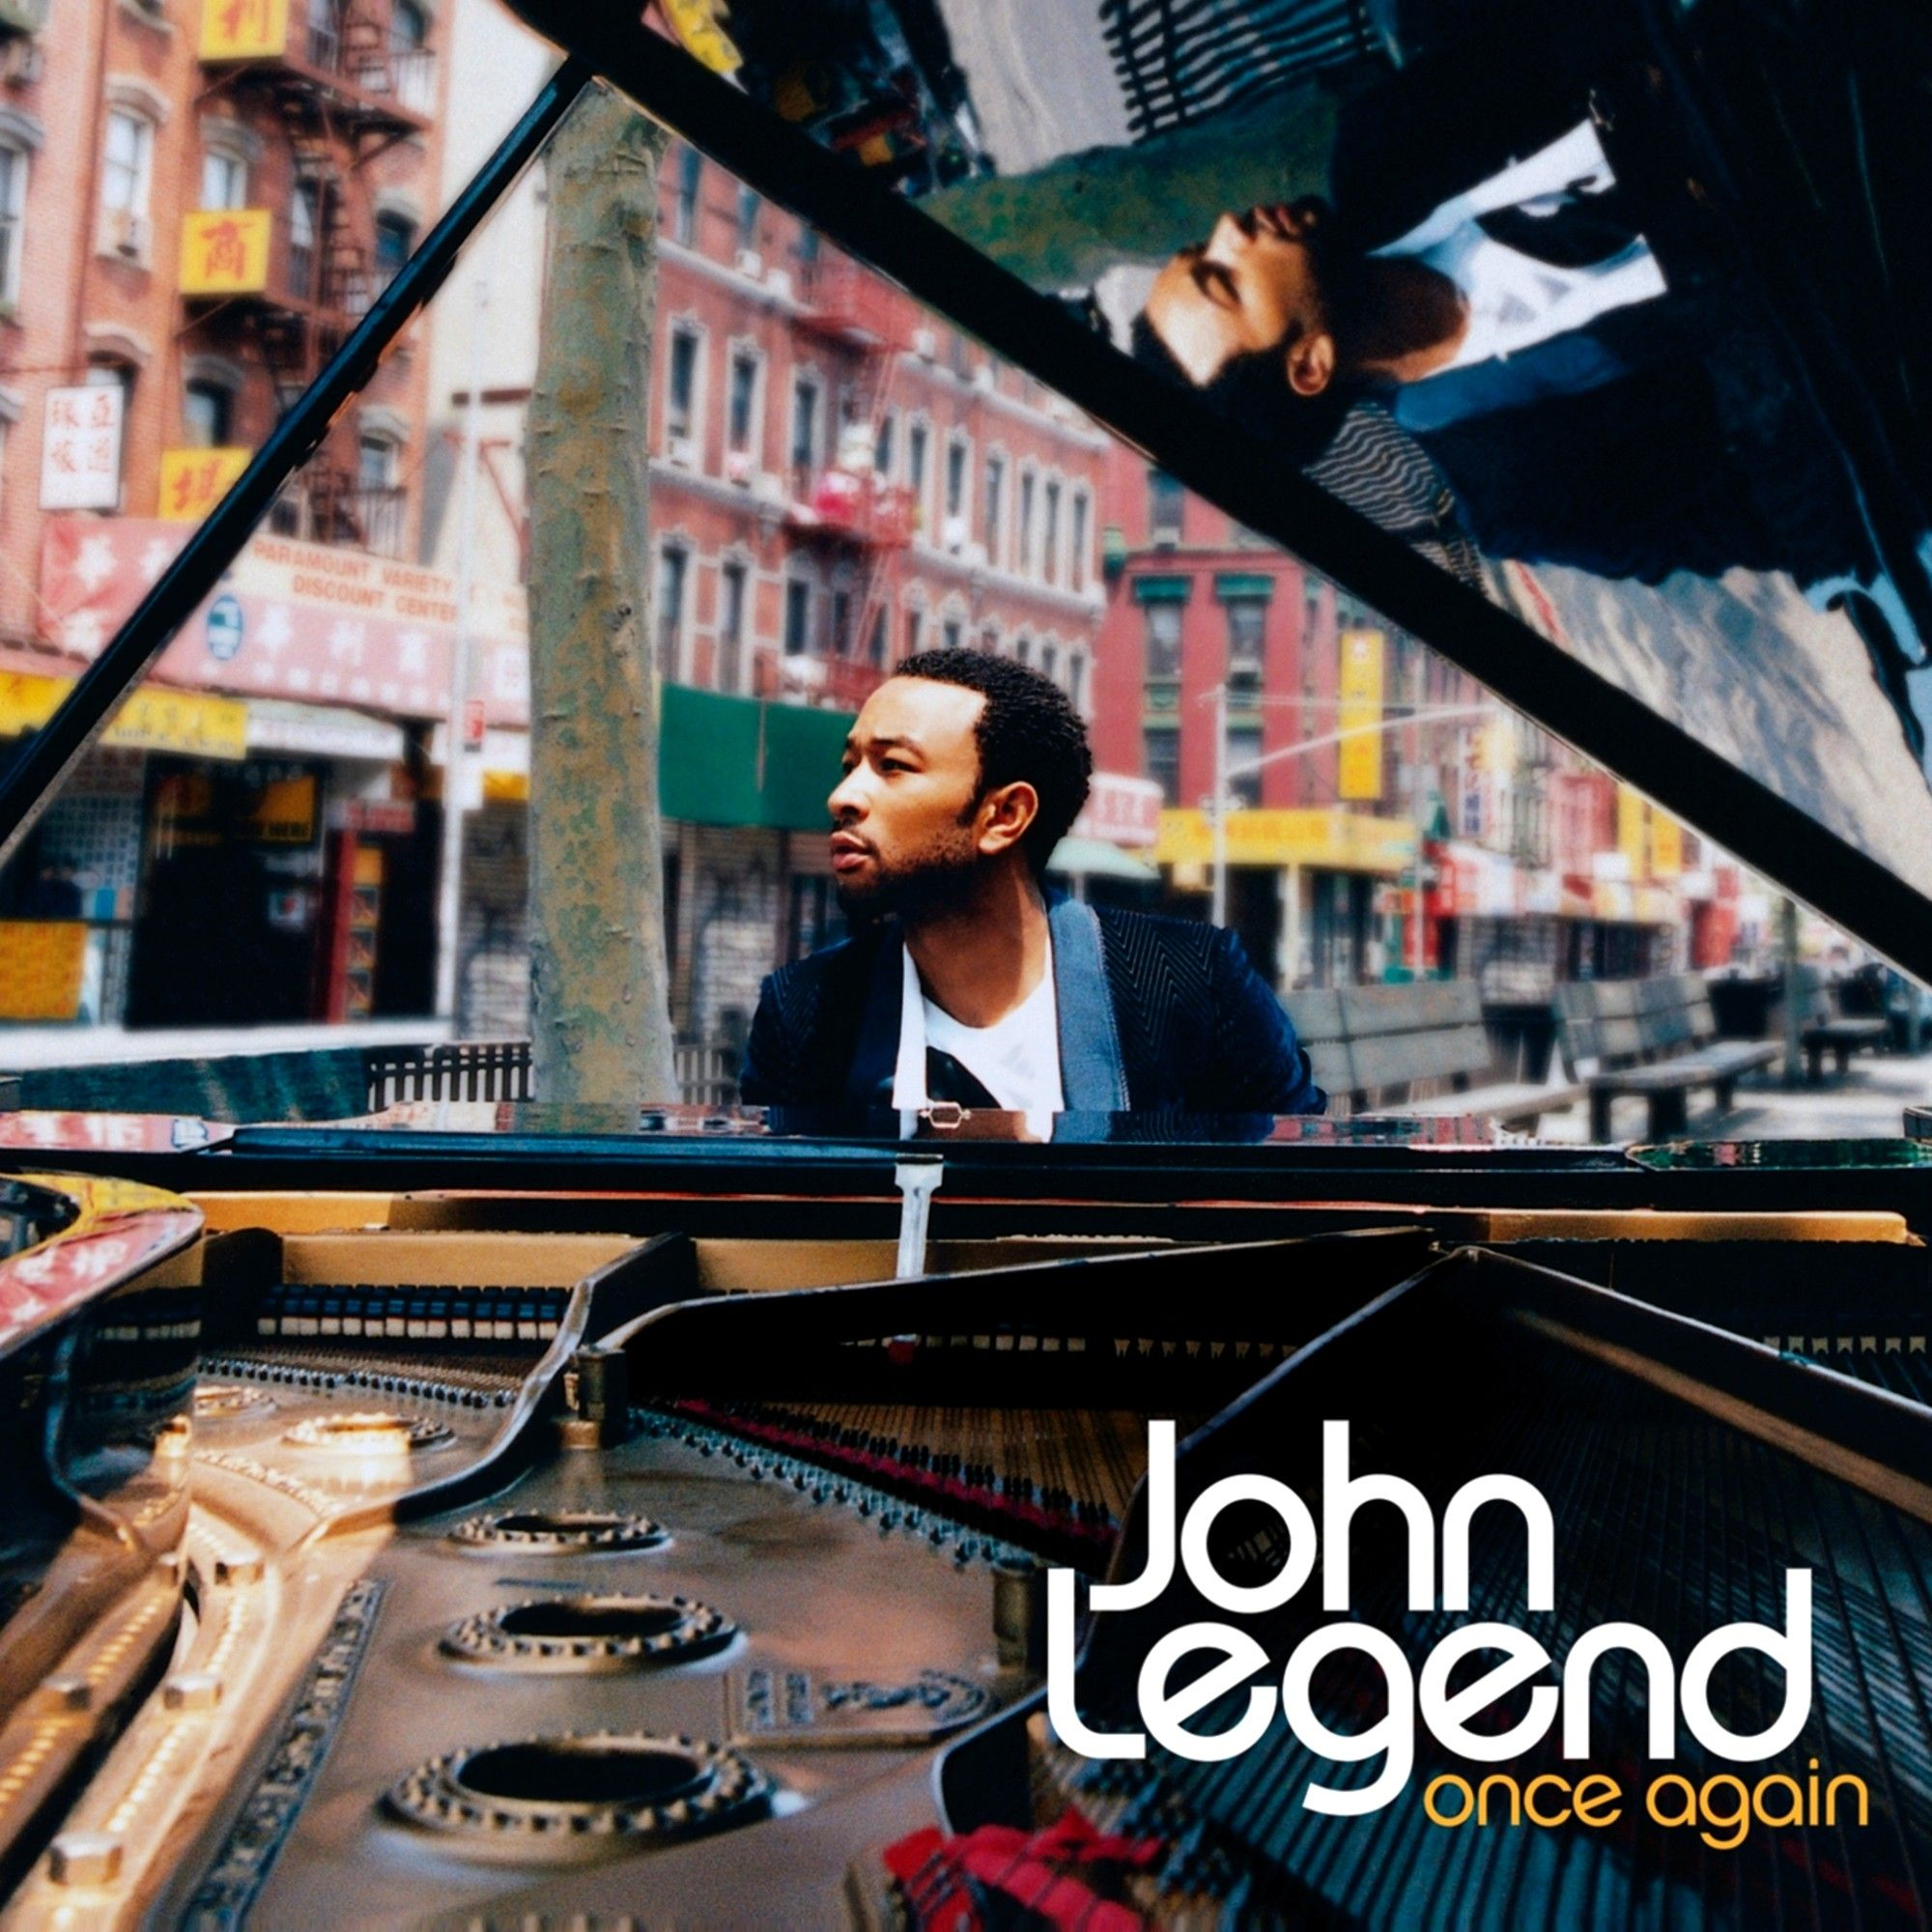 John Legend - Once Again album cover